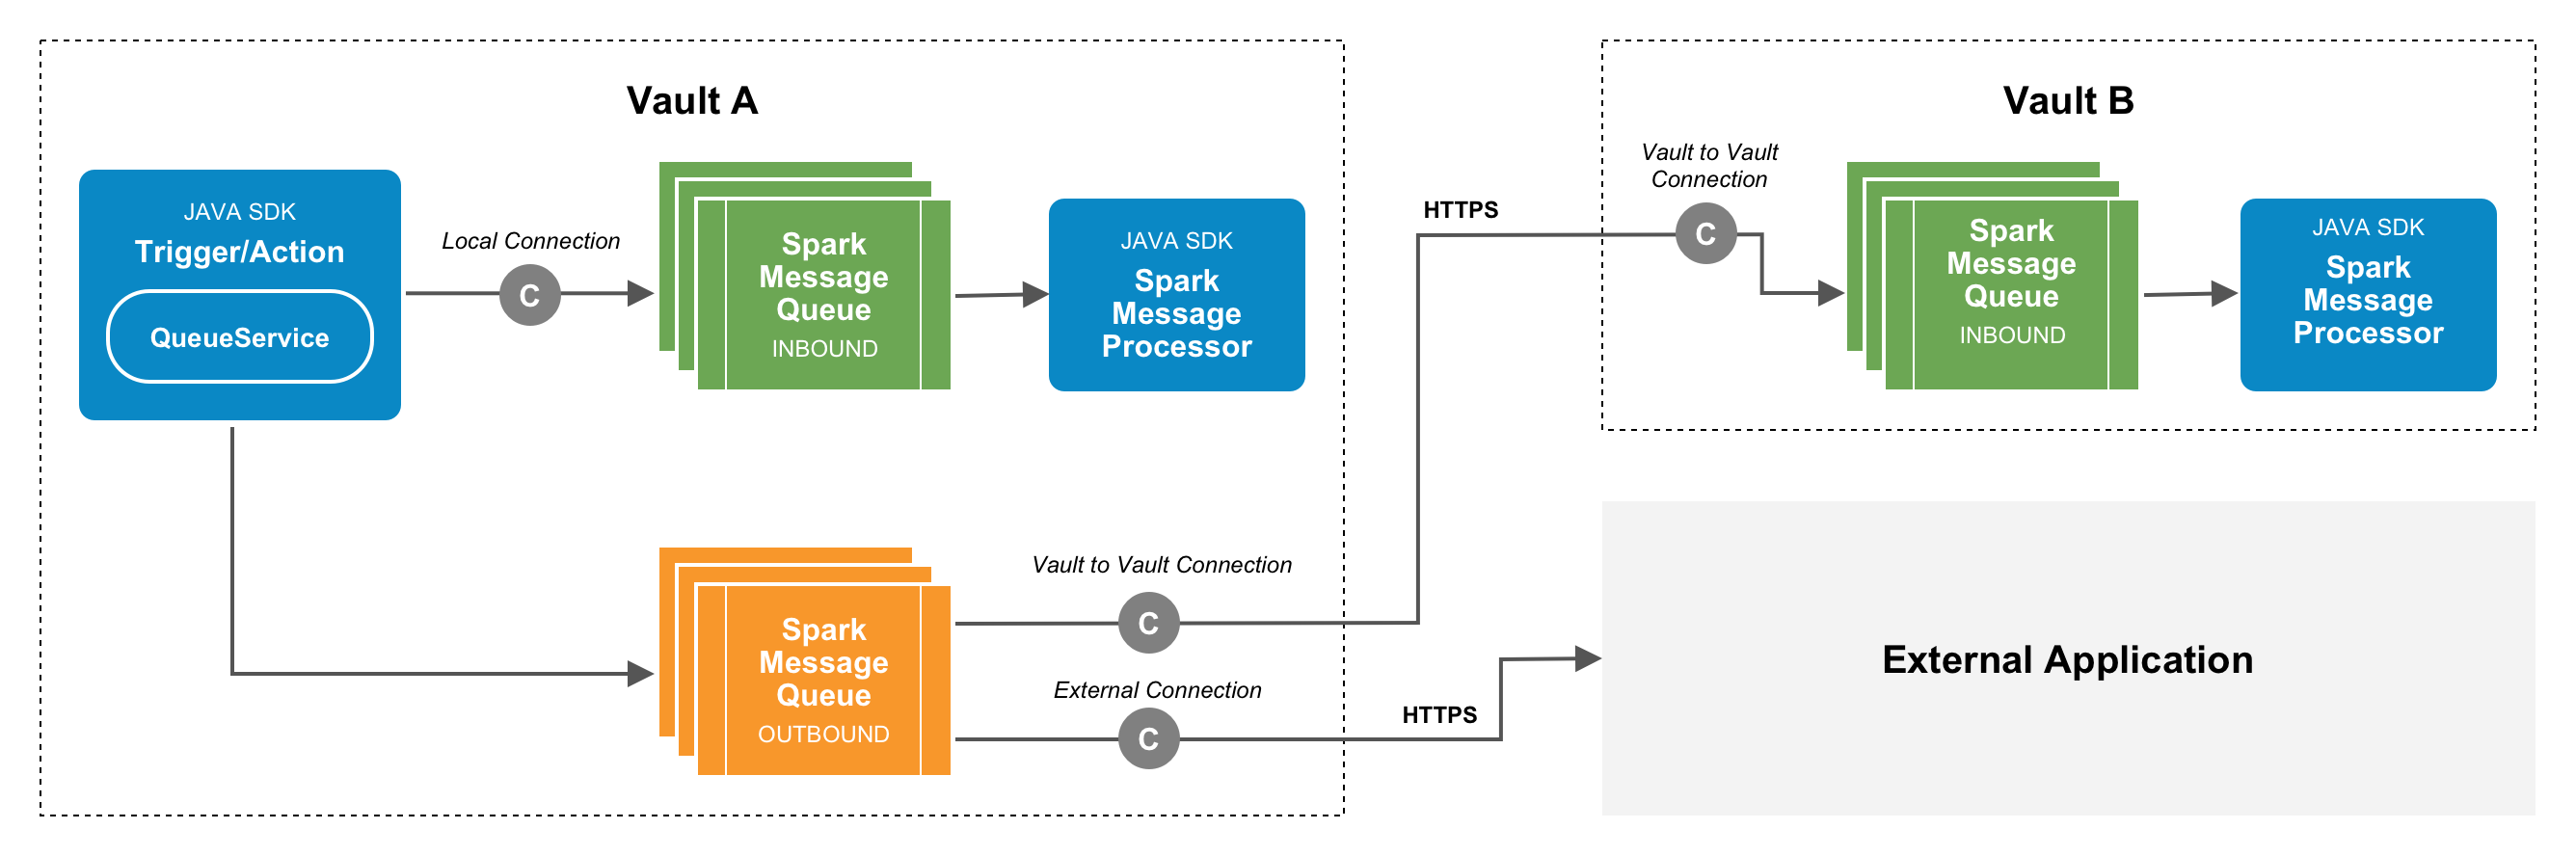 Vault Java SDK Documentation